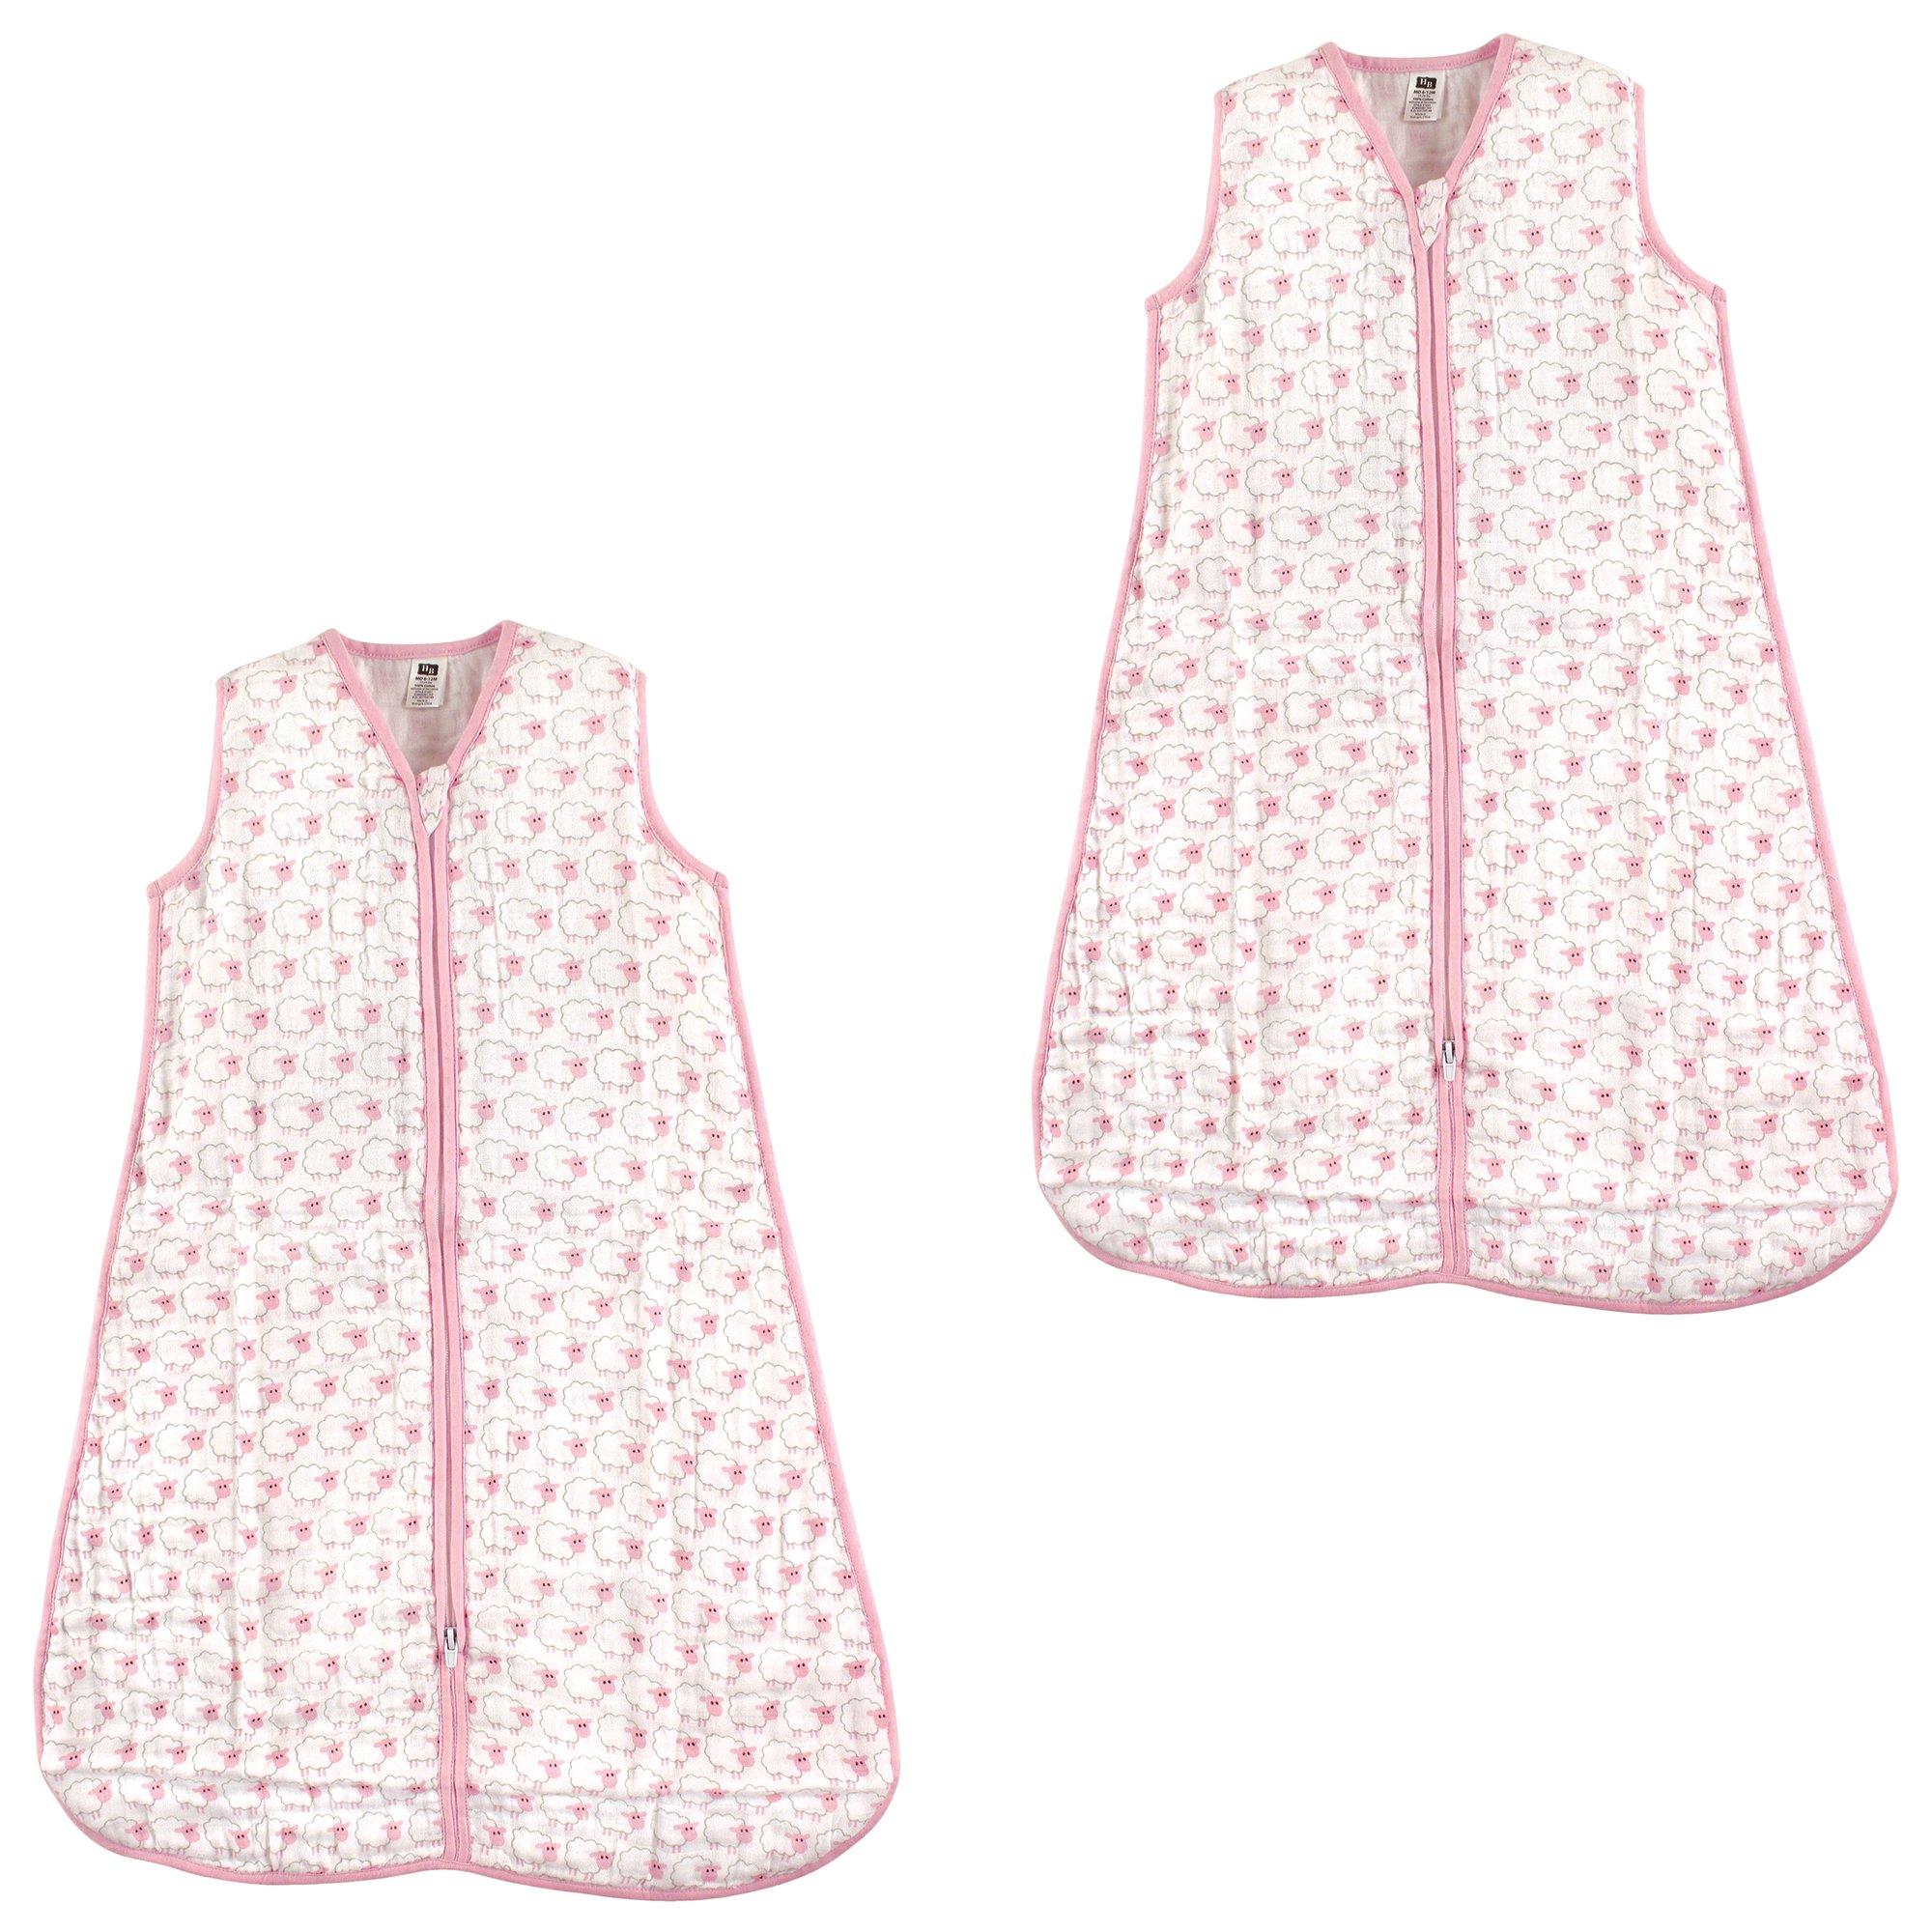 Hudson Baby Wearable Safe Muslin Sleeping Bag, Sheep Pack, 12-18 Months